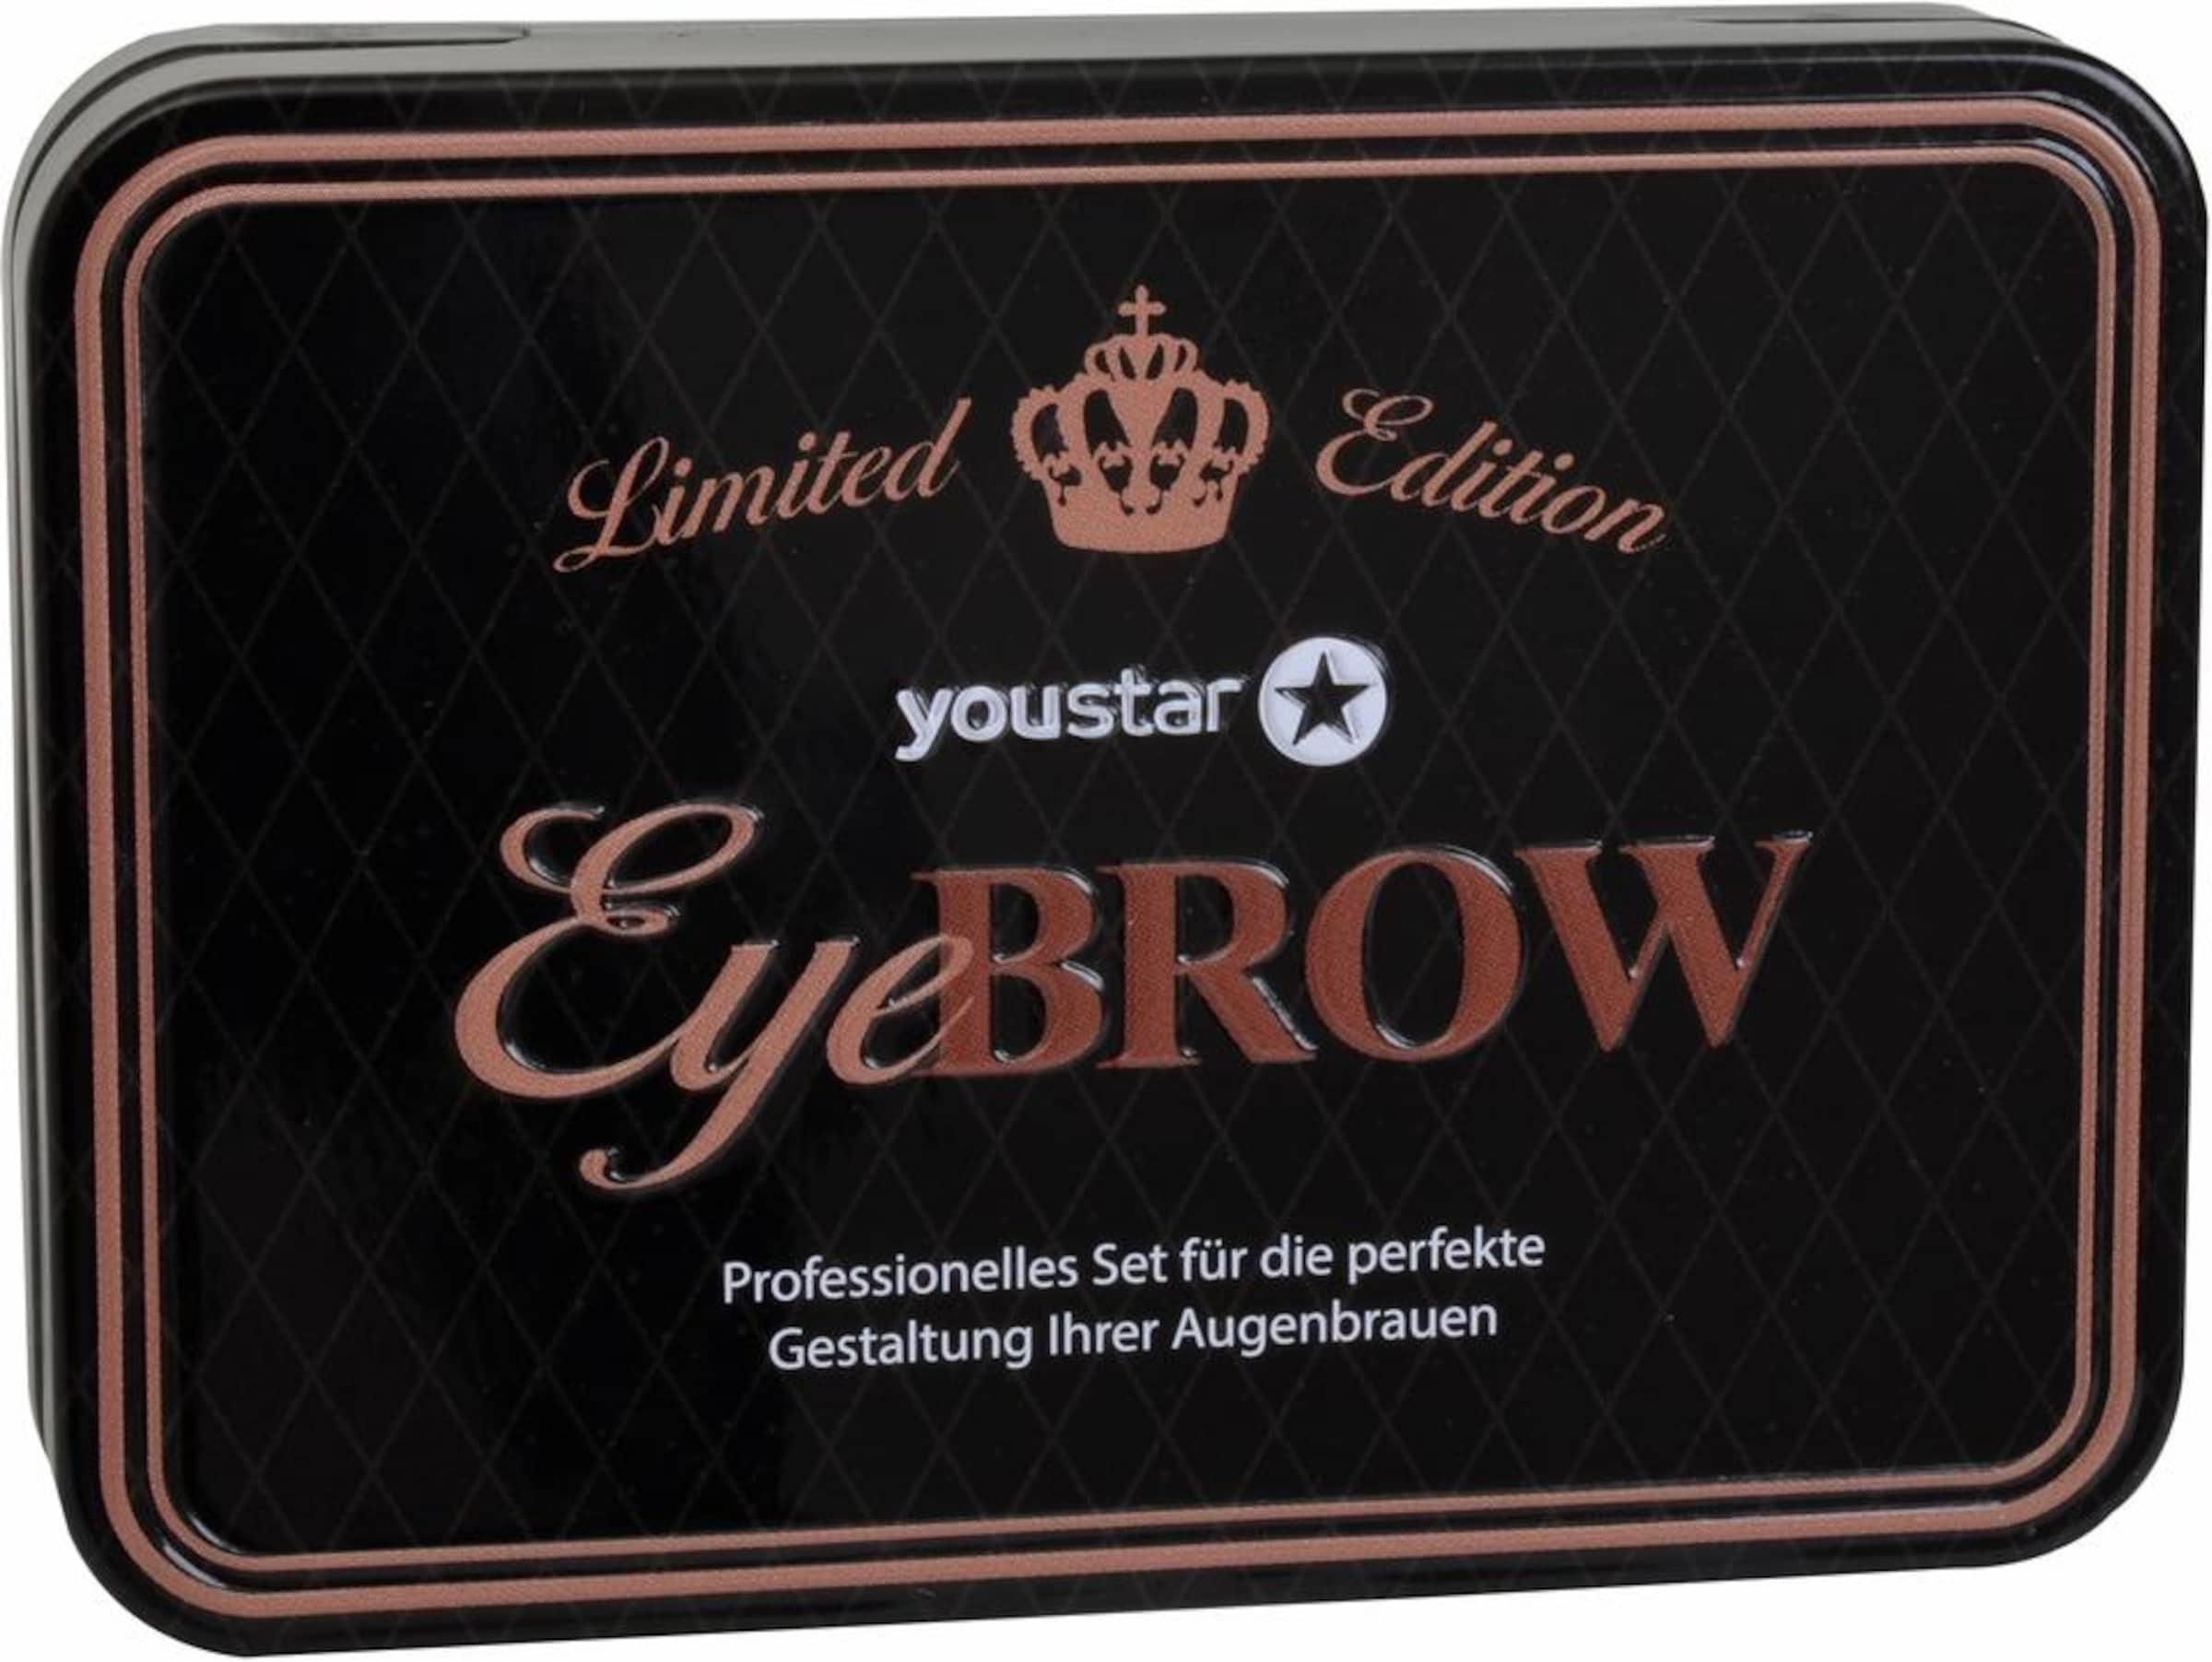 youstar 'Eyebrow Kit', Augenbrauen Make up-Set